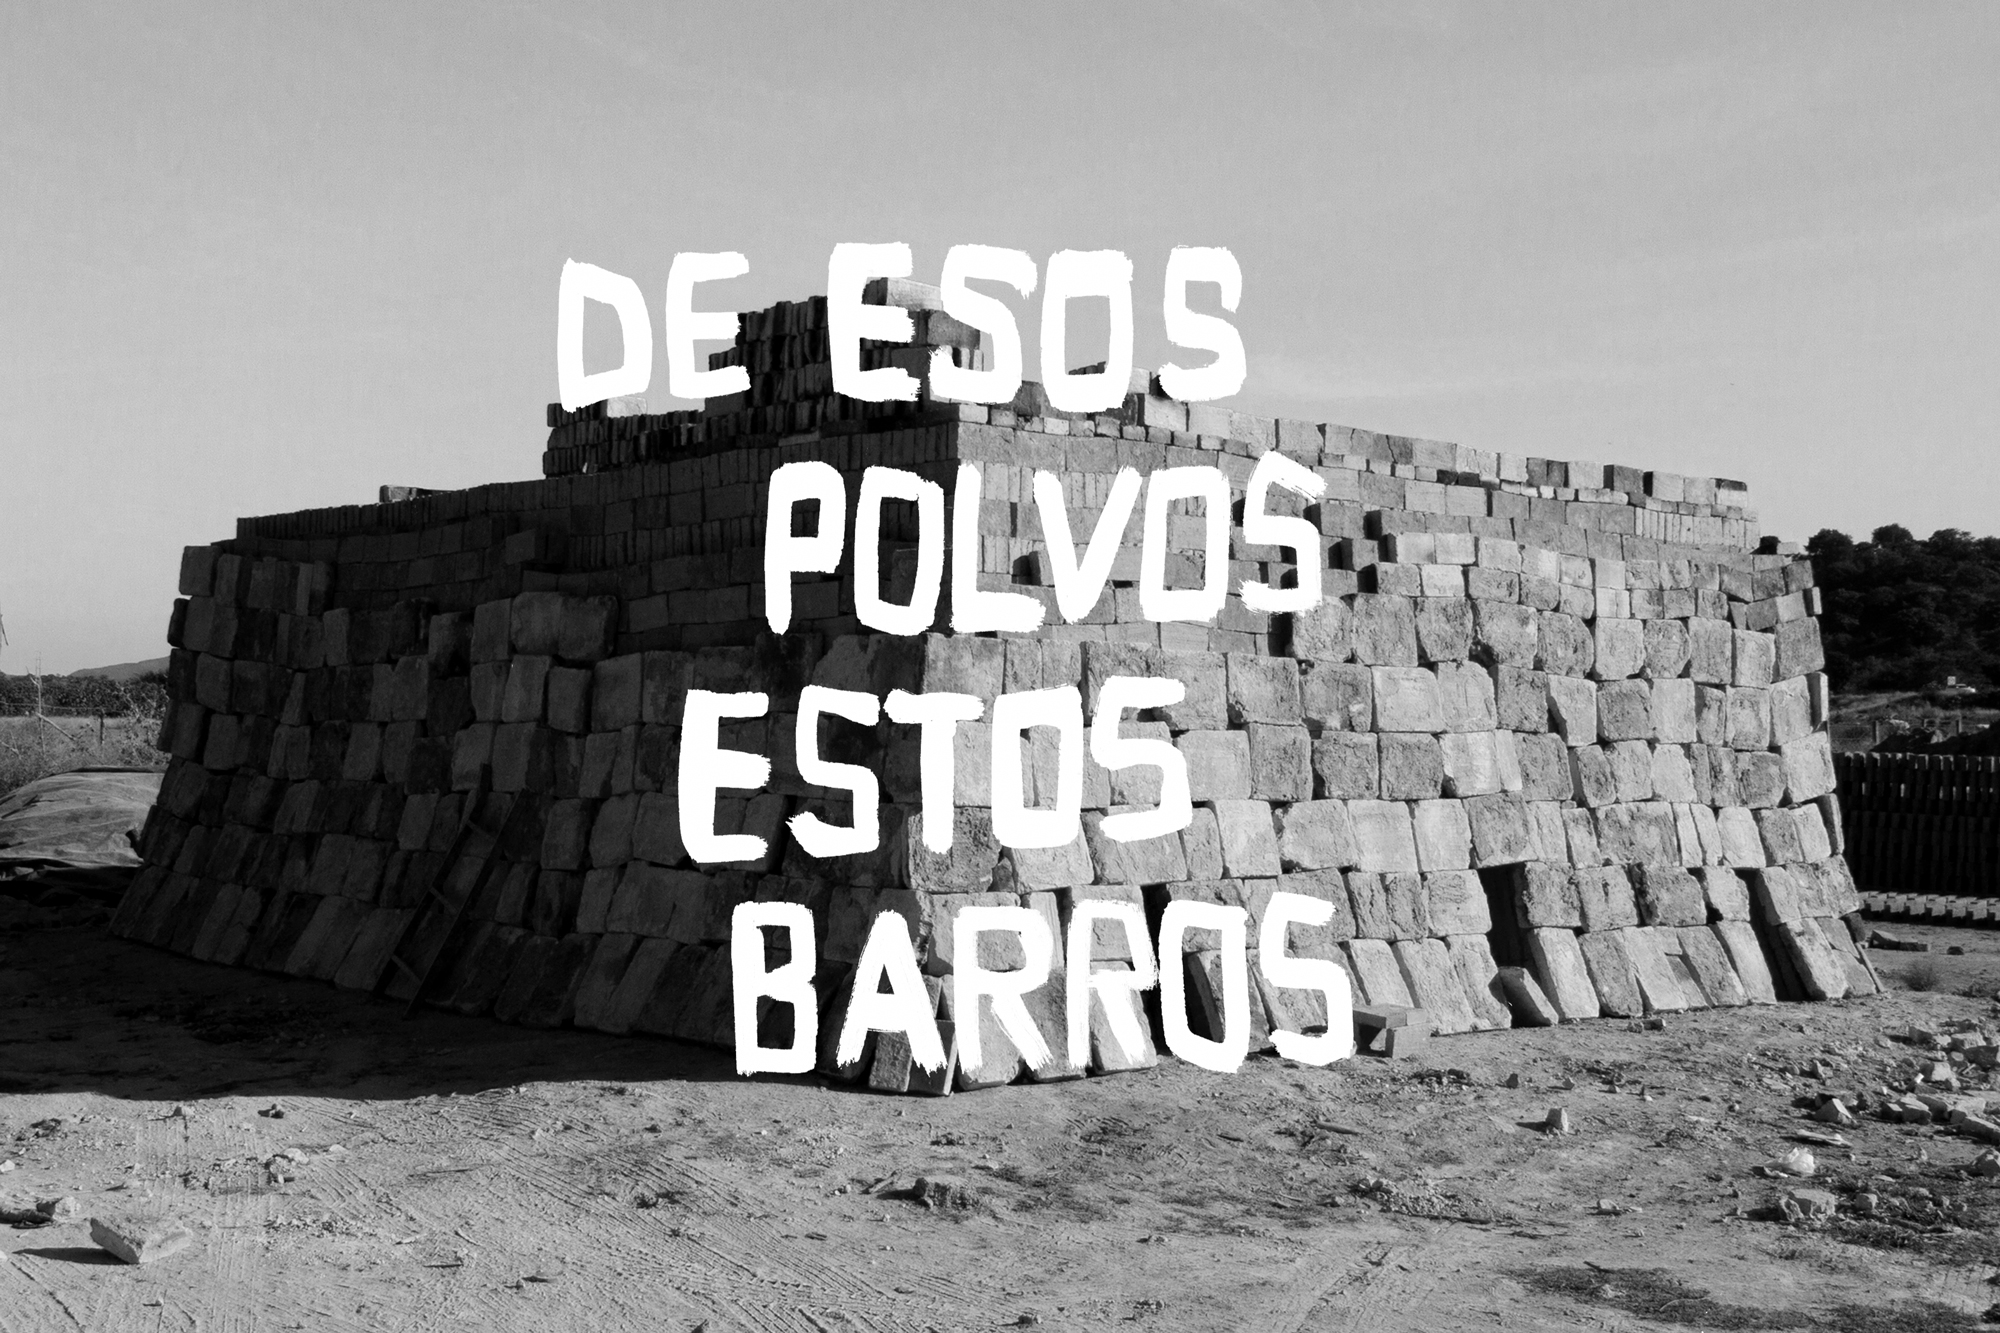 hyperallergic.com: Alejandro Almanza Pereda's Sensorial Film on the Ancient Process of Brickmaking in Western Mexico